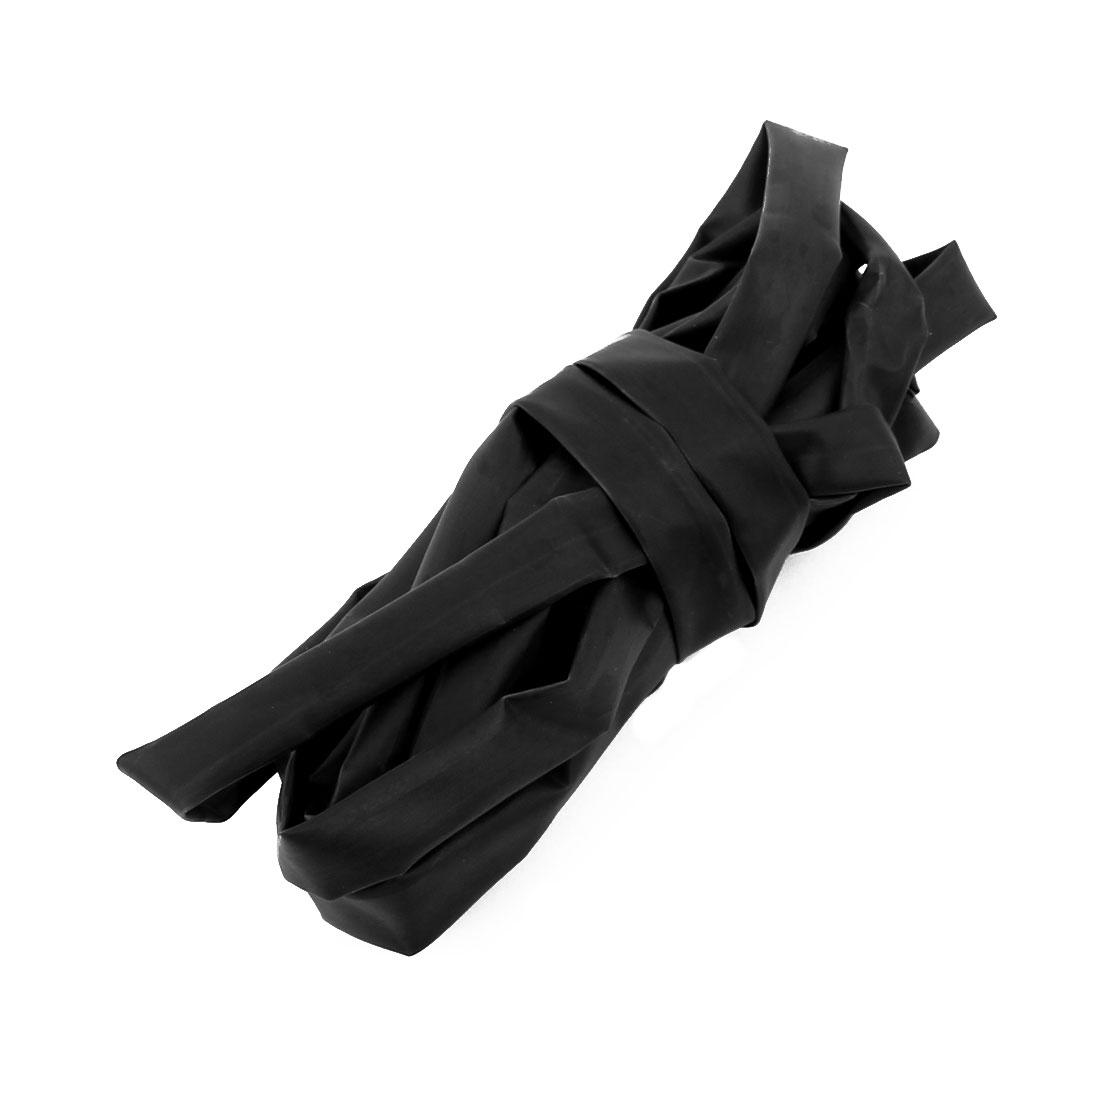 Polyolefin 6mm Dia 2:1 Heat Shrink Tubing Shrinkable Tube Black 2.Long